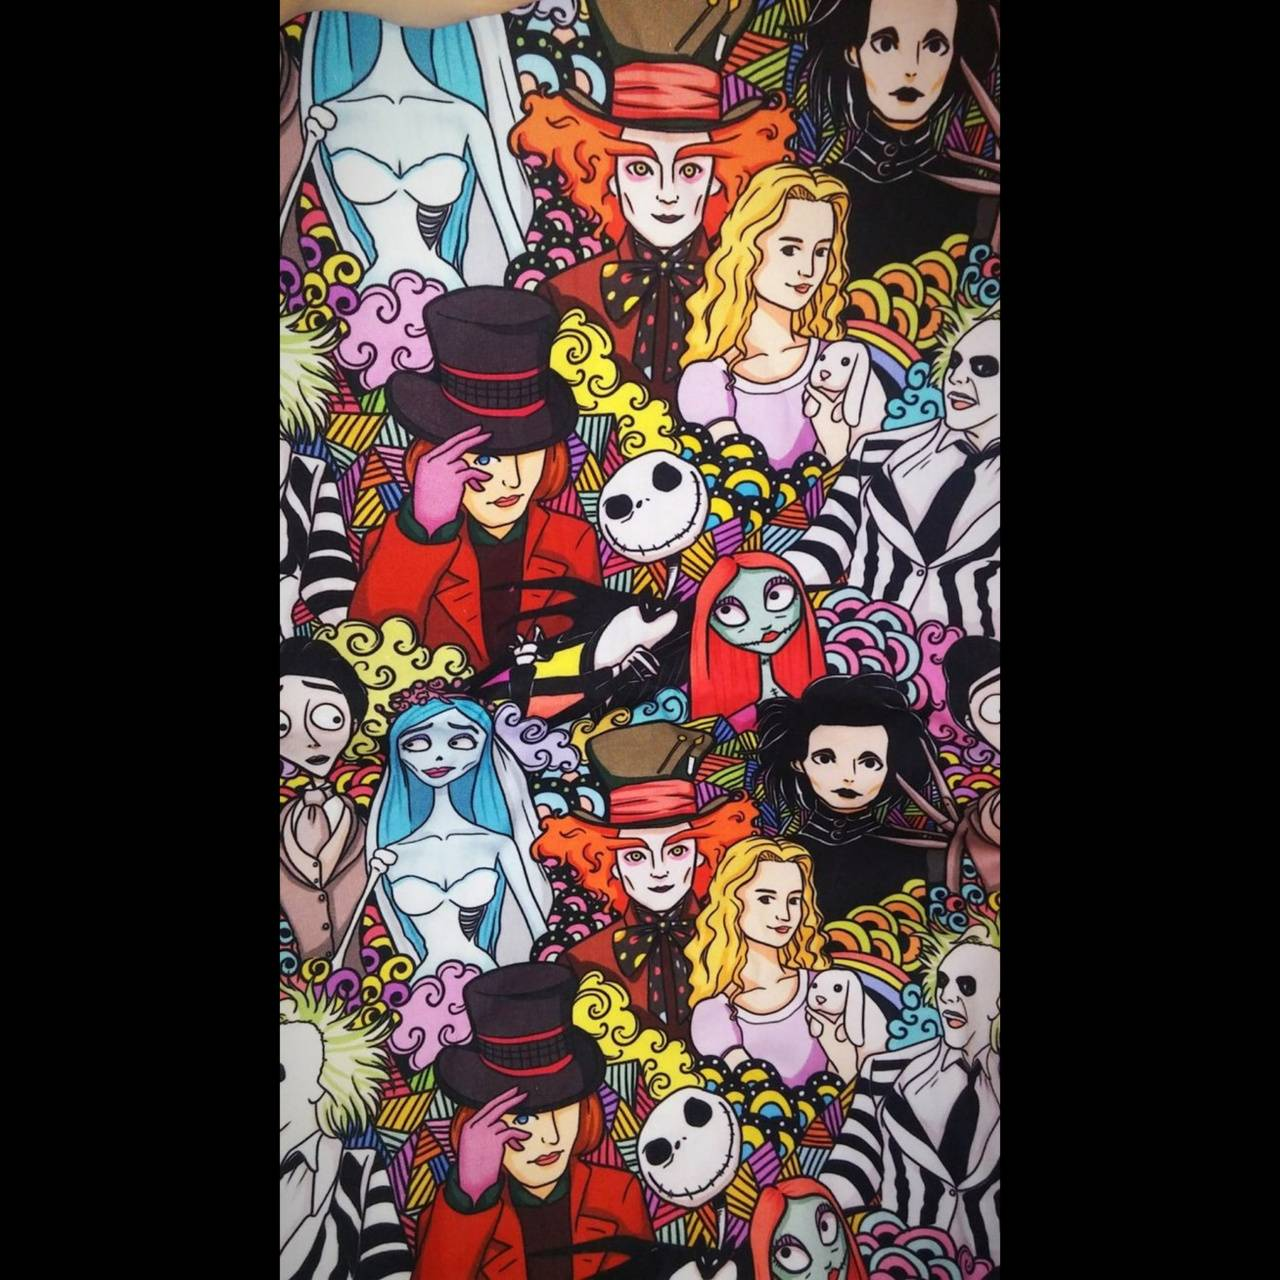 Tim Burton Wallpaper By Beasty316 F4 Free On Zedge